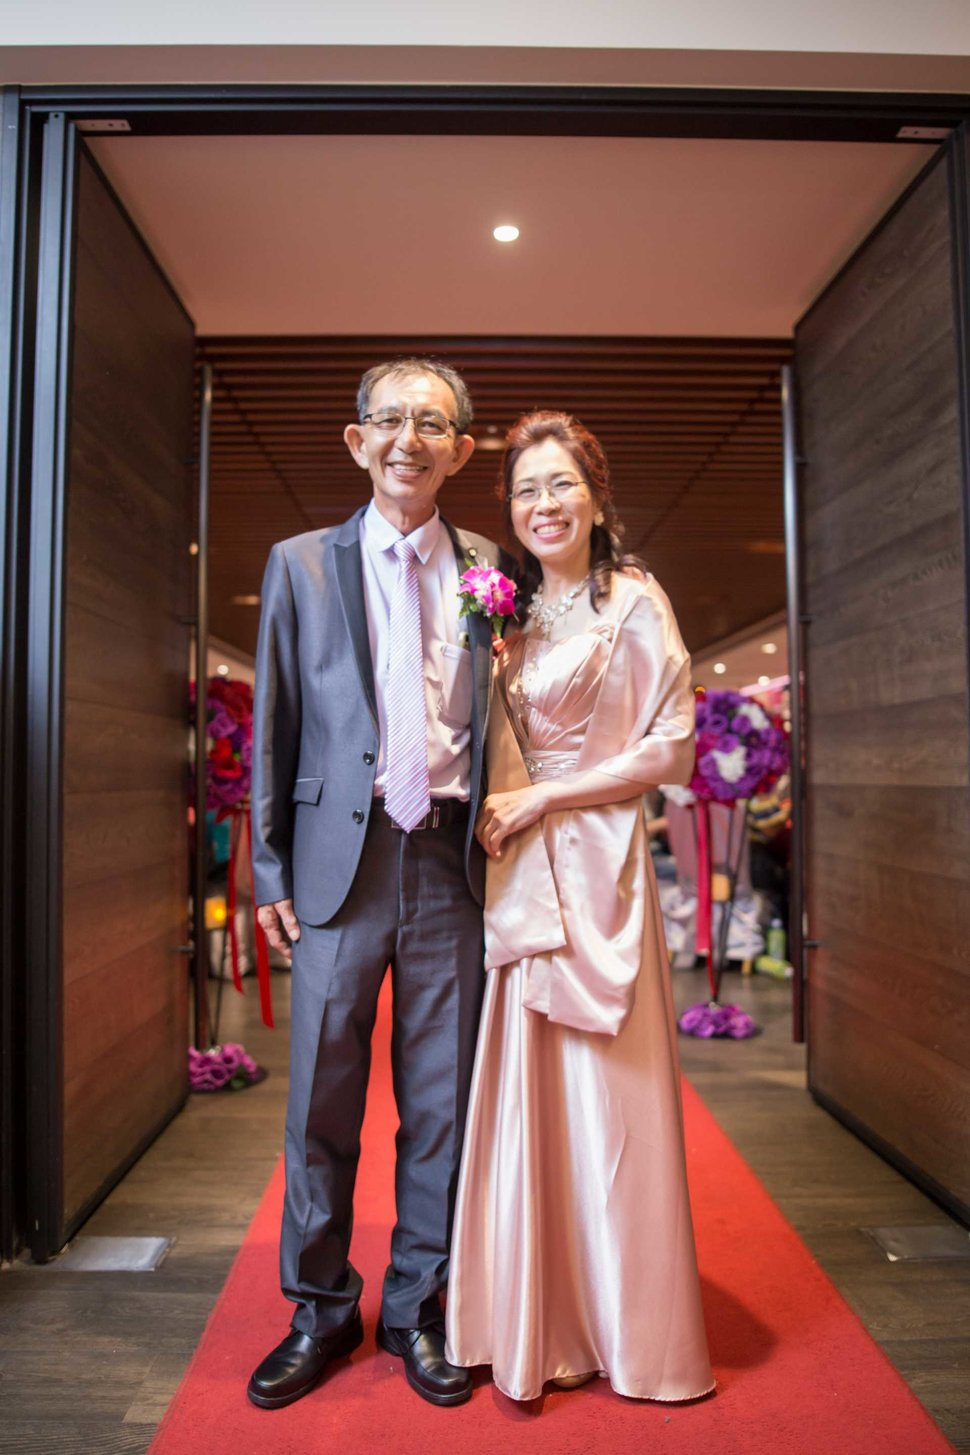 Wedding_Photo_2017_-058 - 高雄婚攝Luke-路克《結婚吧》